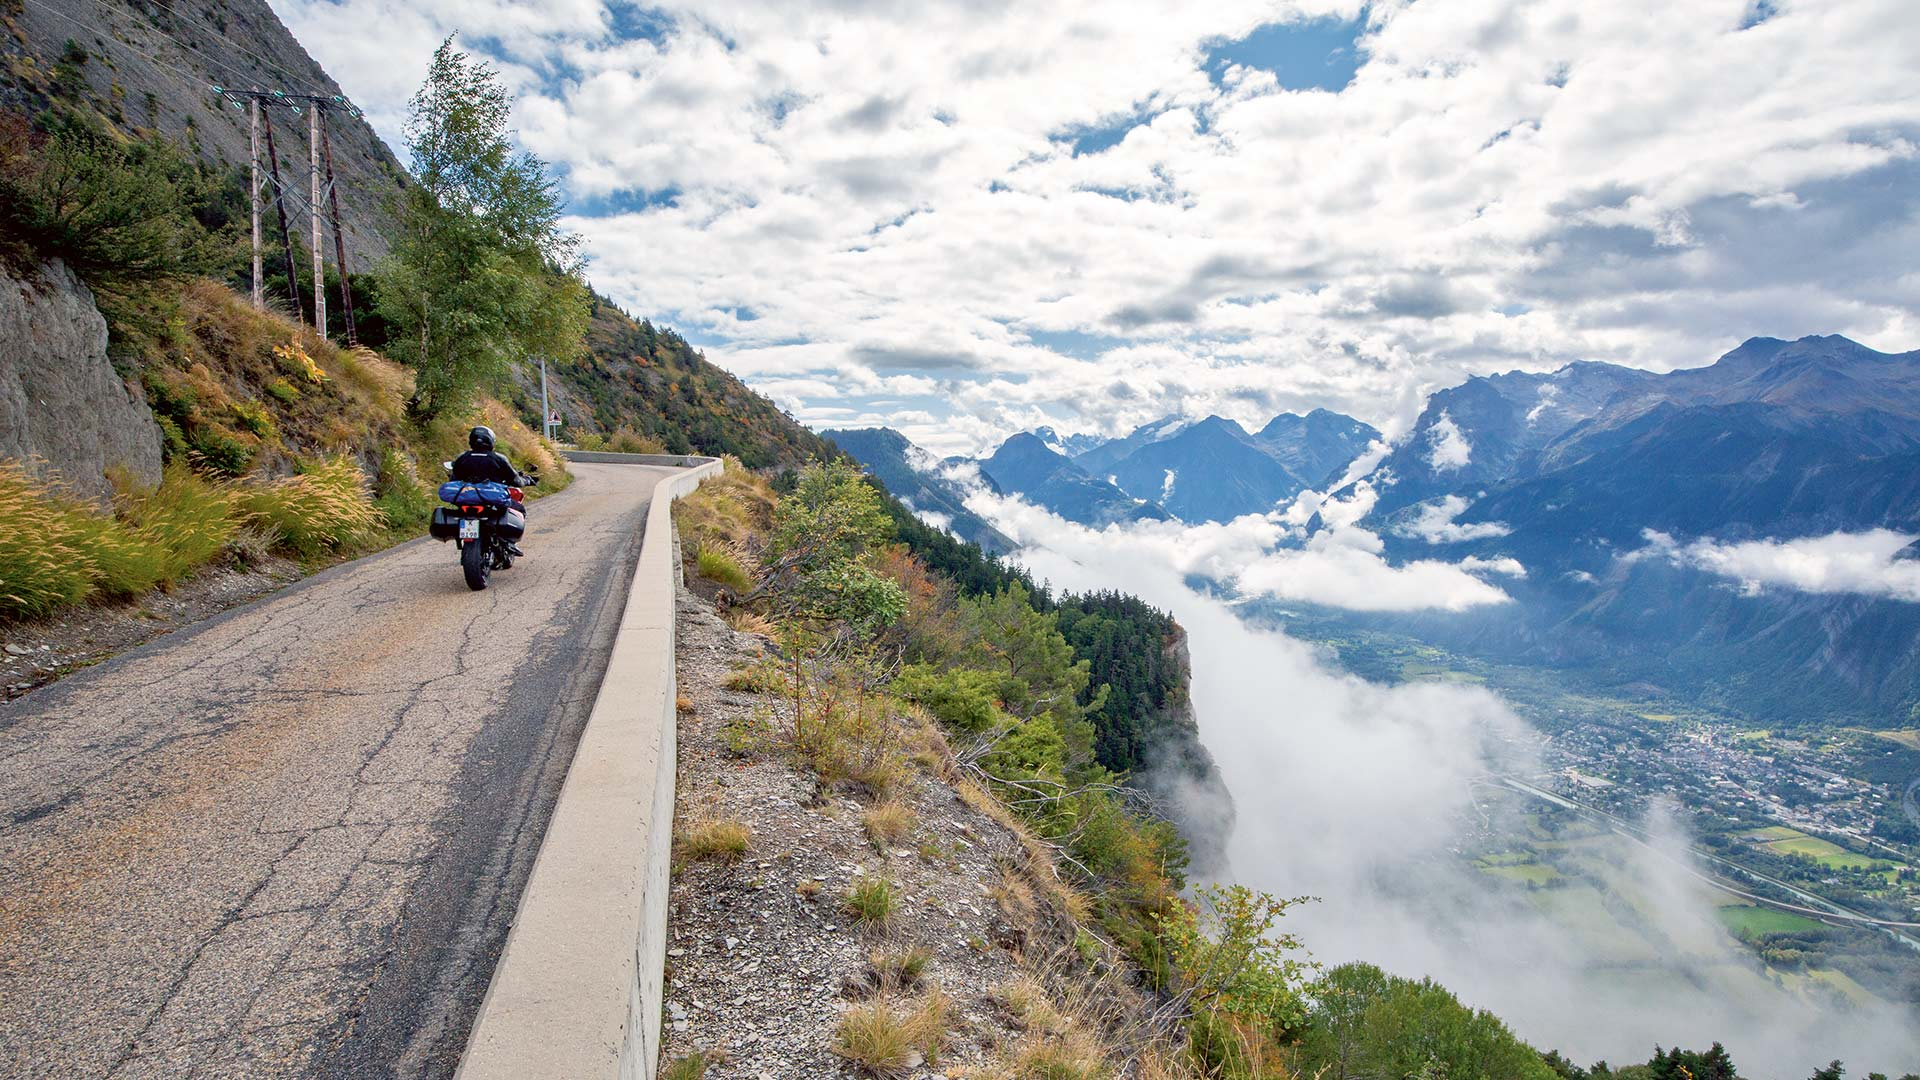 Berg-Fest - Alp-Traum II